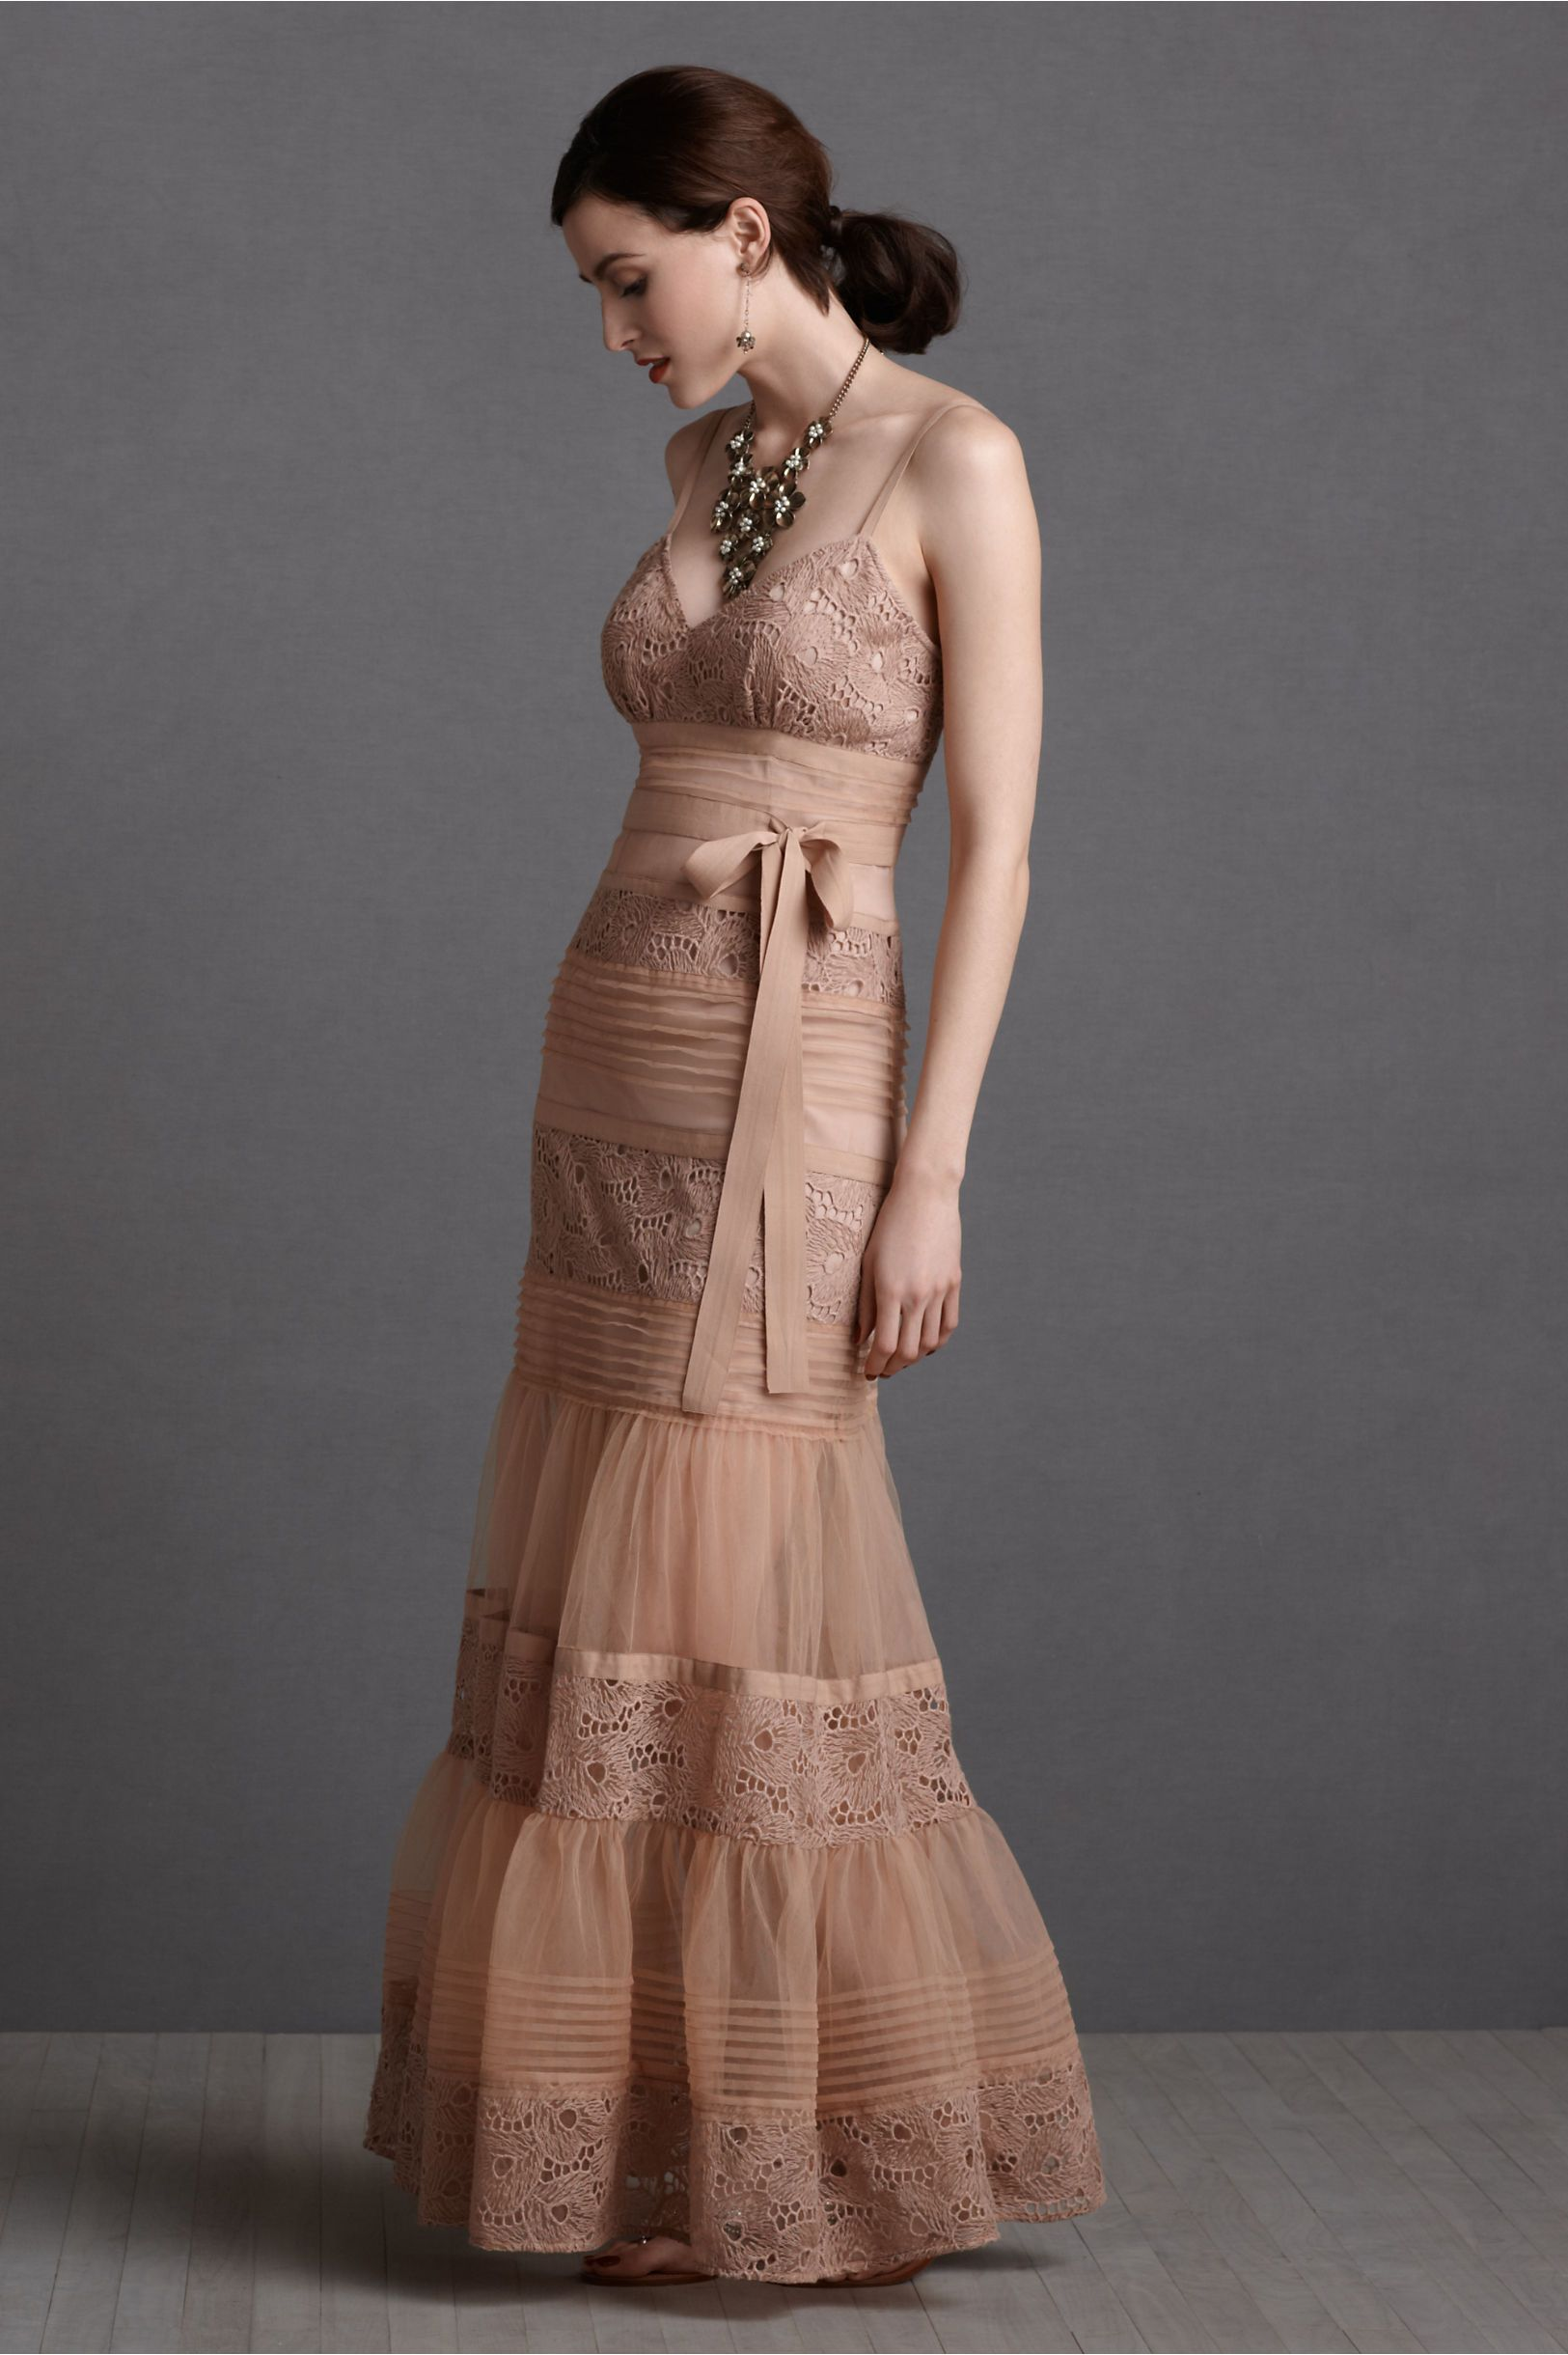 2 piece crop top wedding dress  Rosewater Parfait Dress from BHLDN  Romantic Dresses  Pinterest